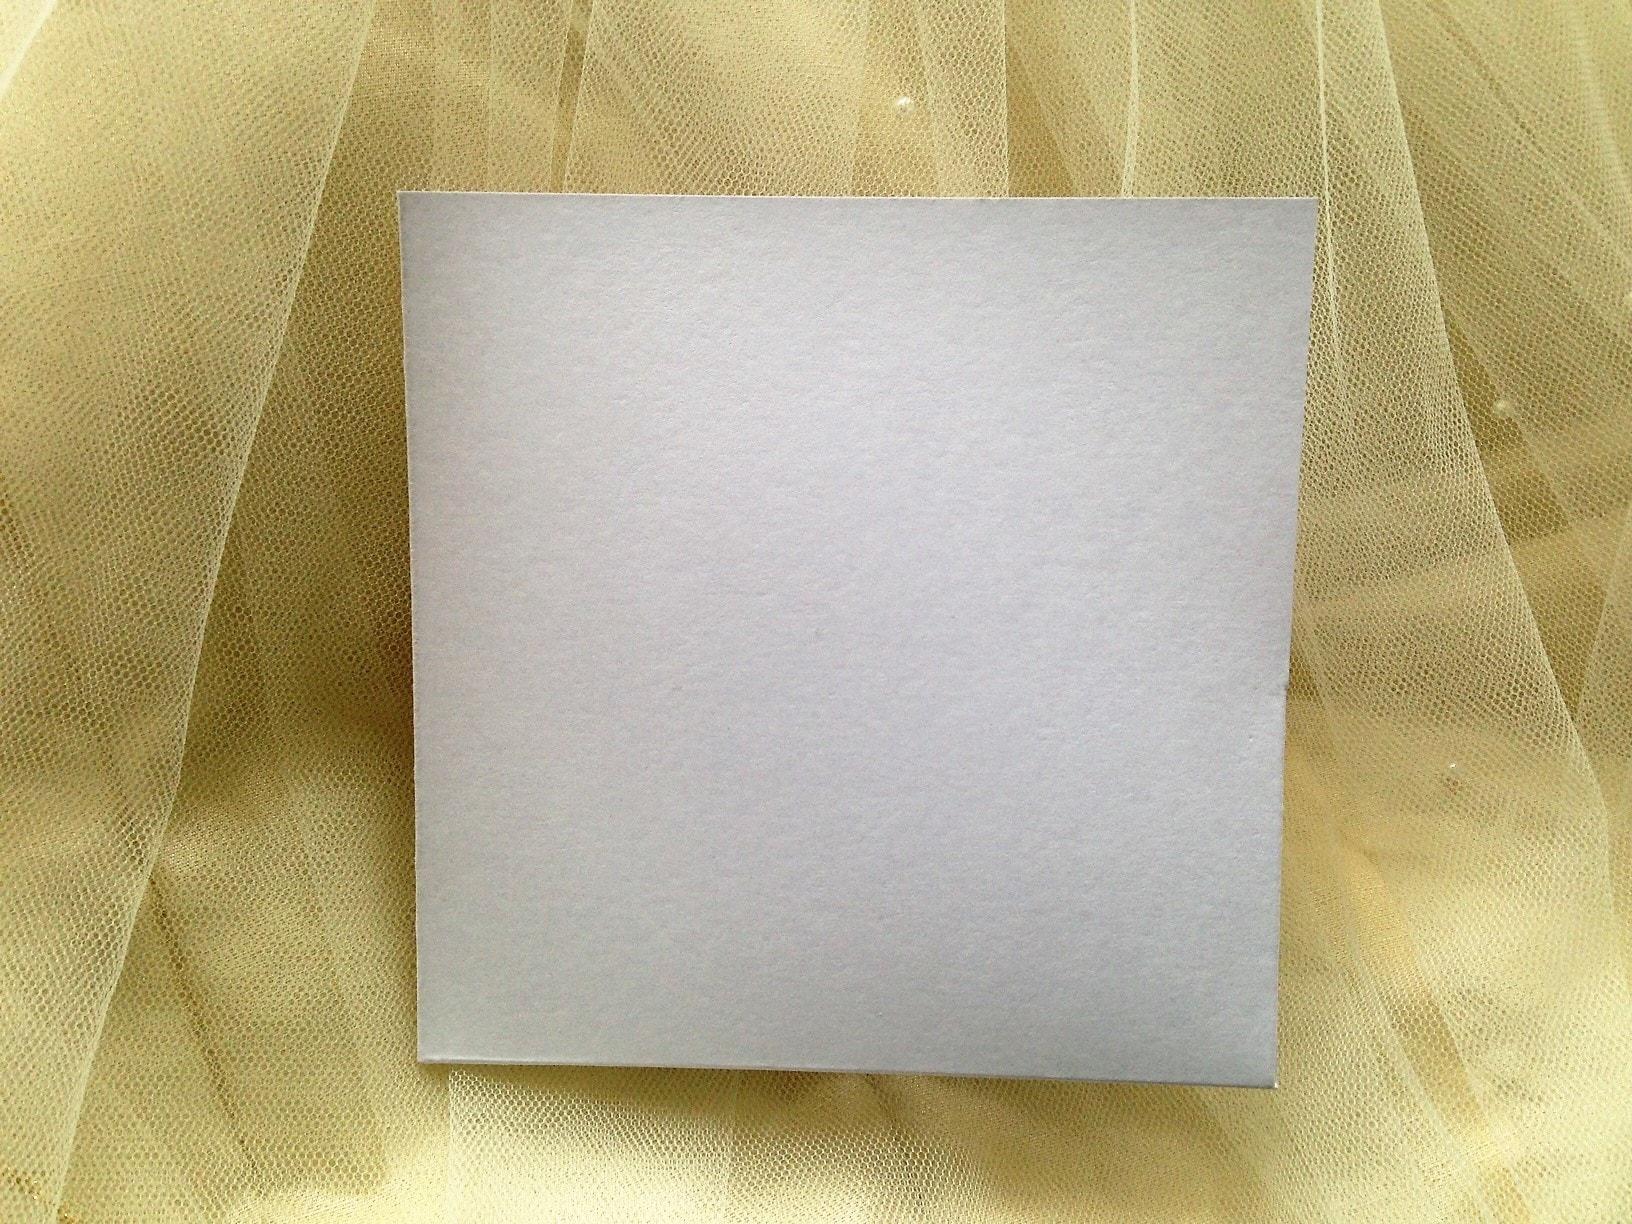 pocketfold wedding invitations getting hitched chain invites - 28 ...